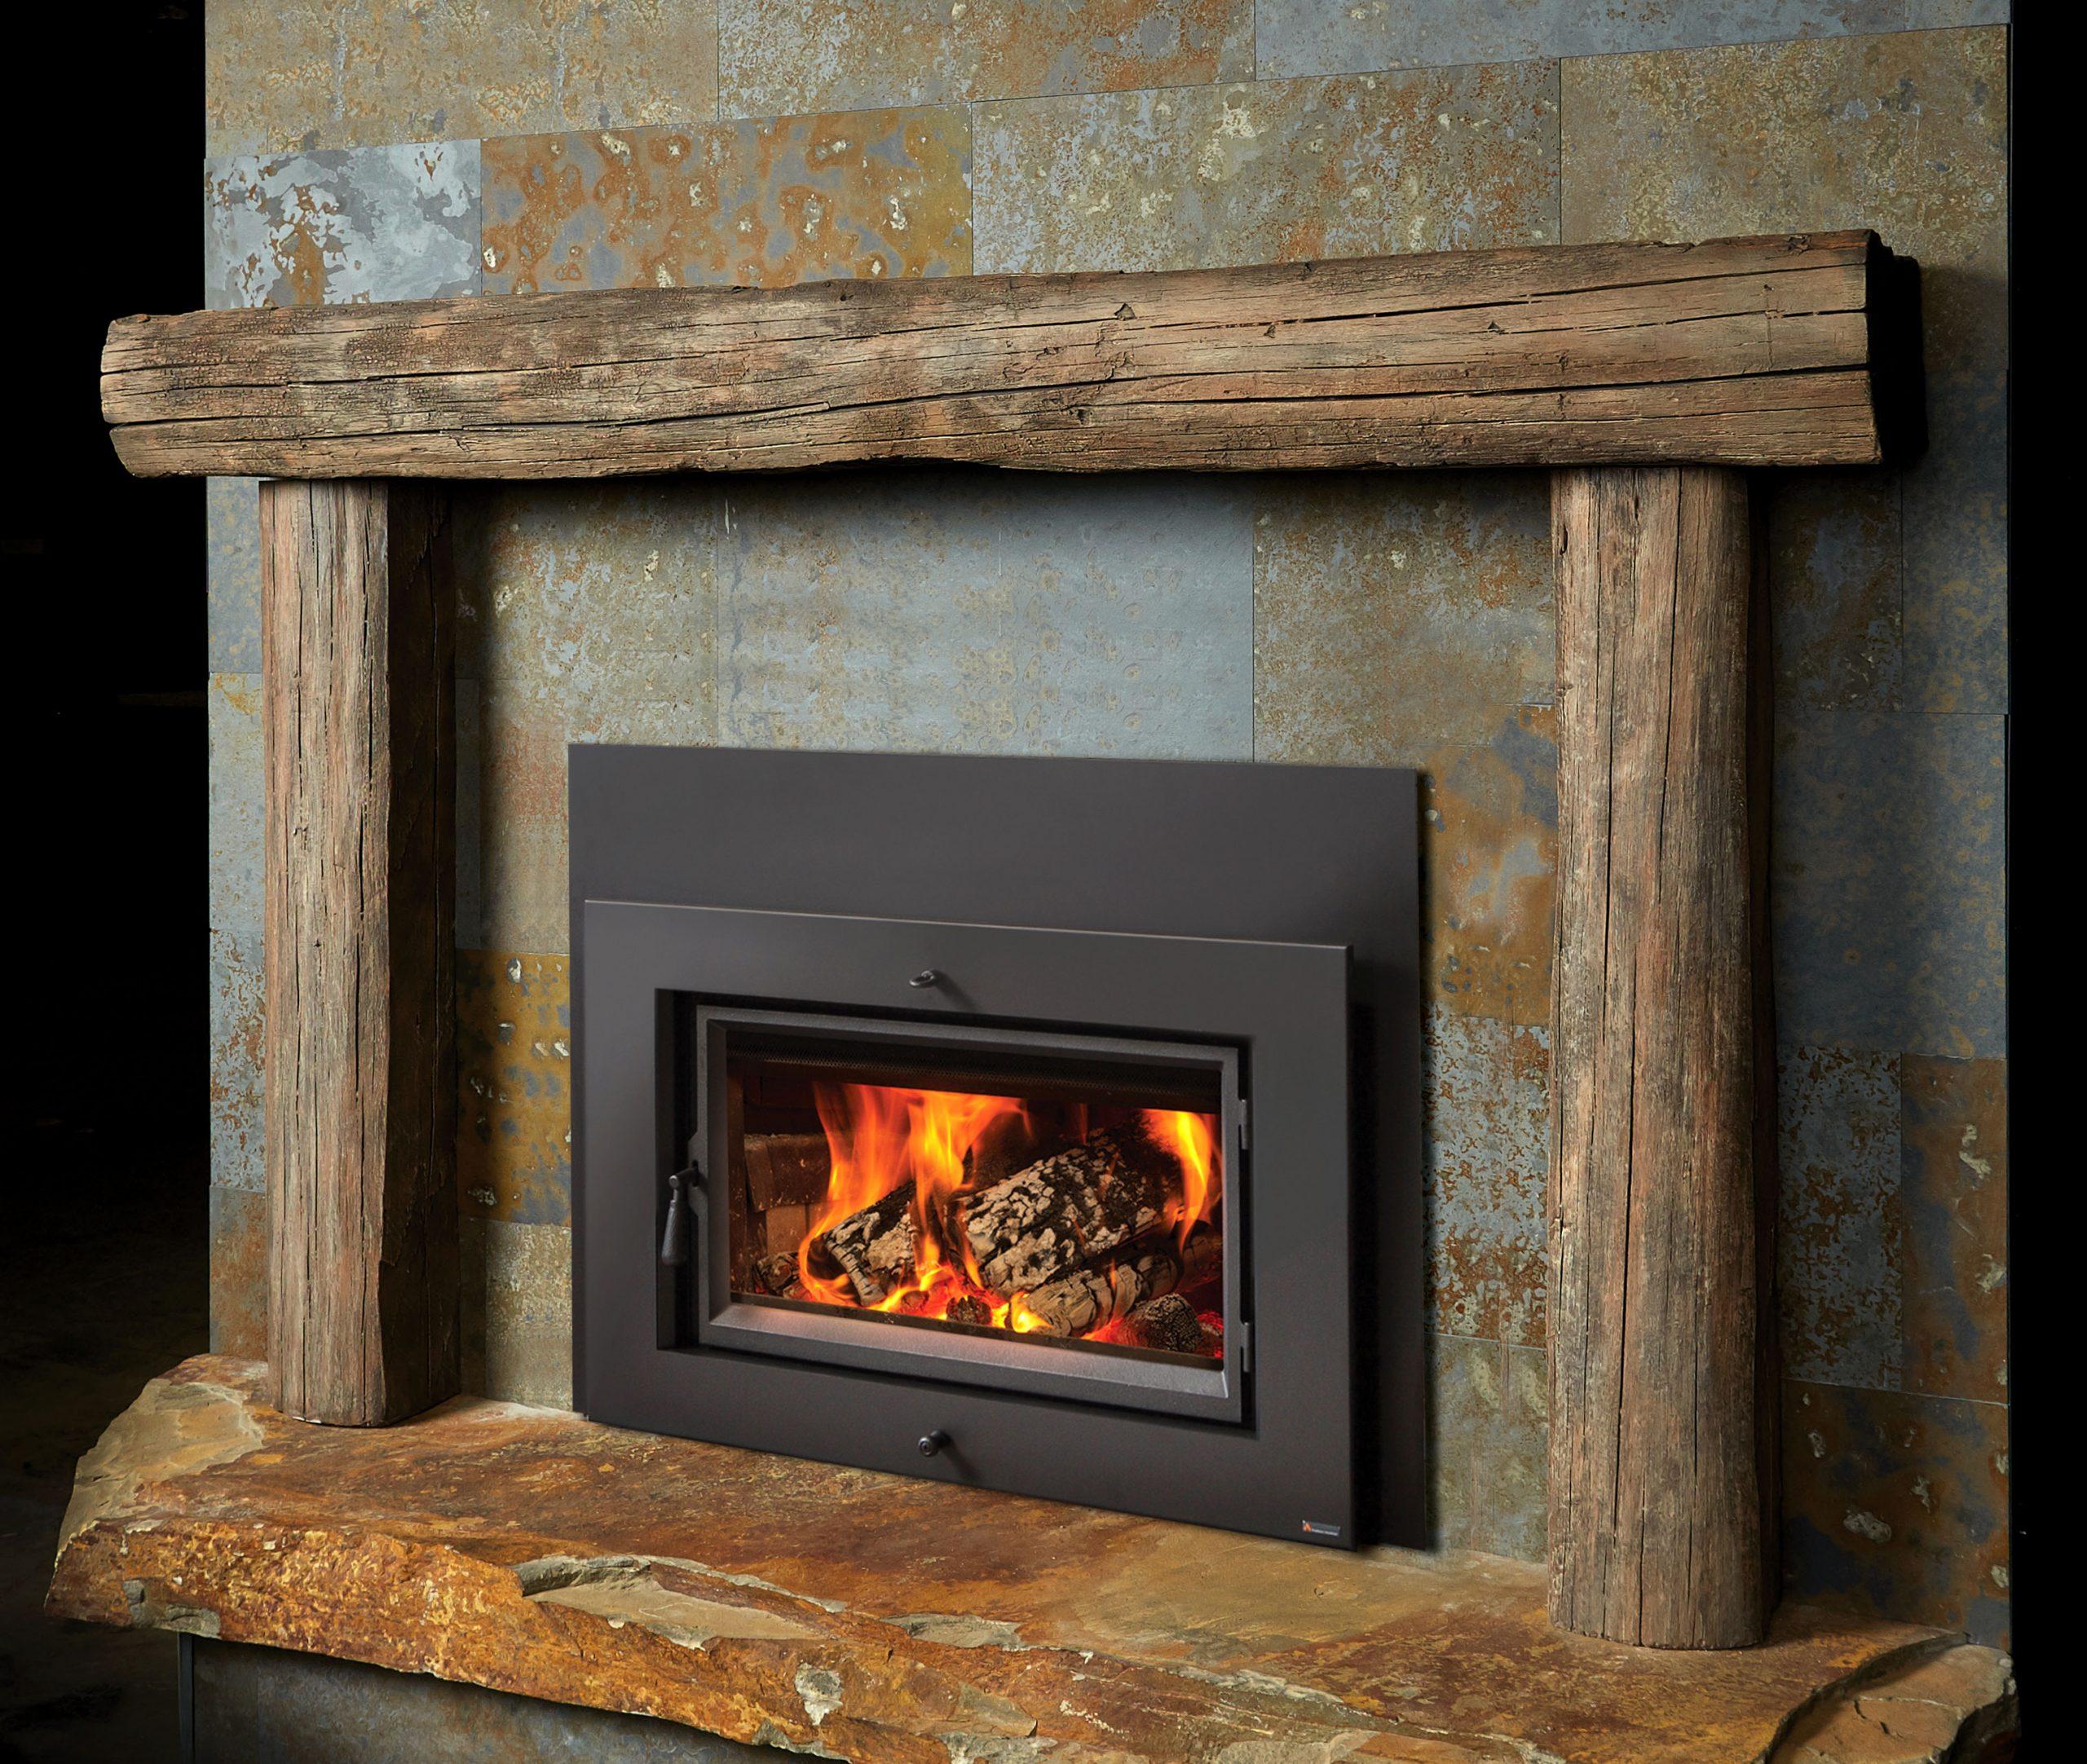 Hewn Timber Effect Concrete Mantel & Legs